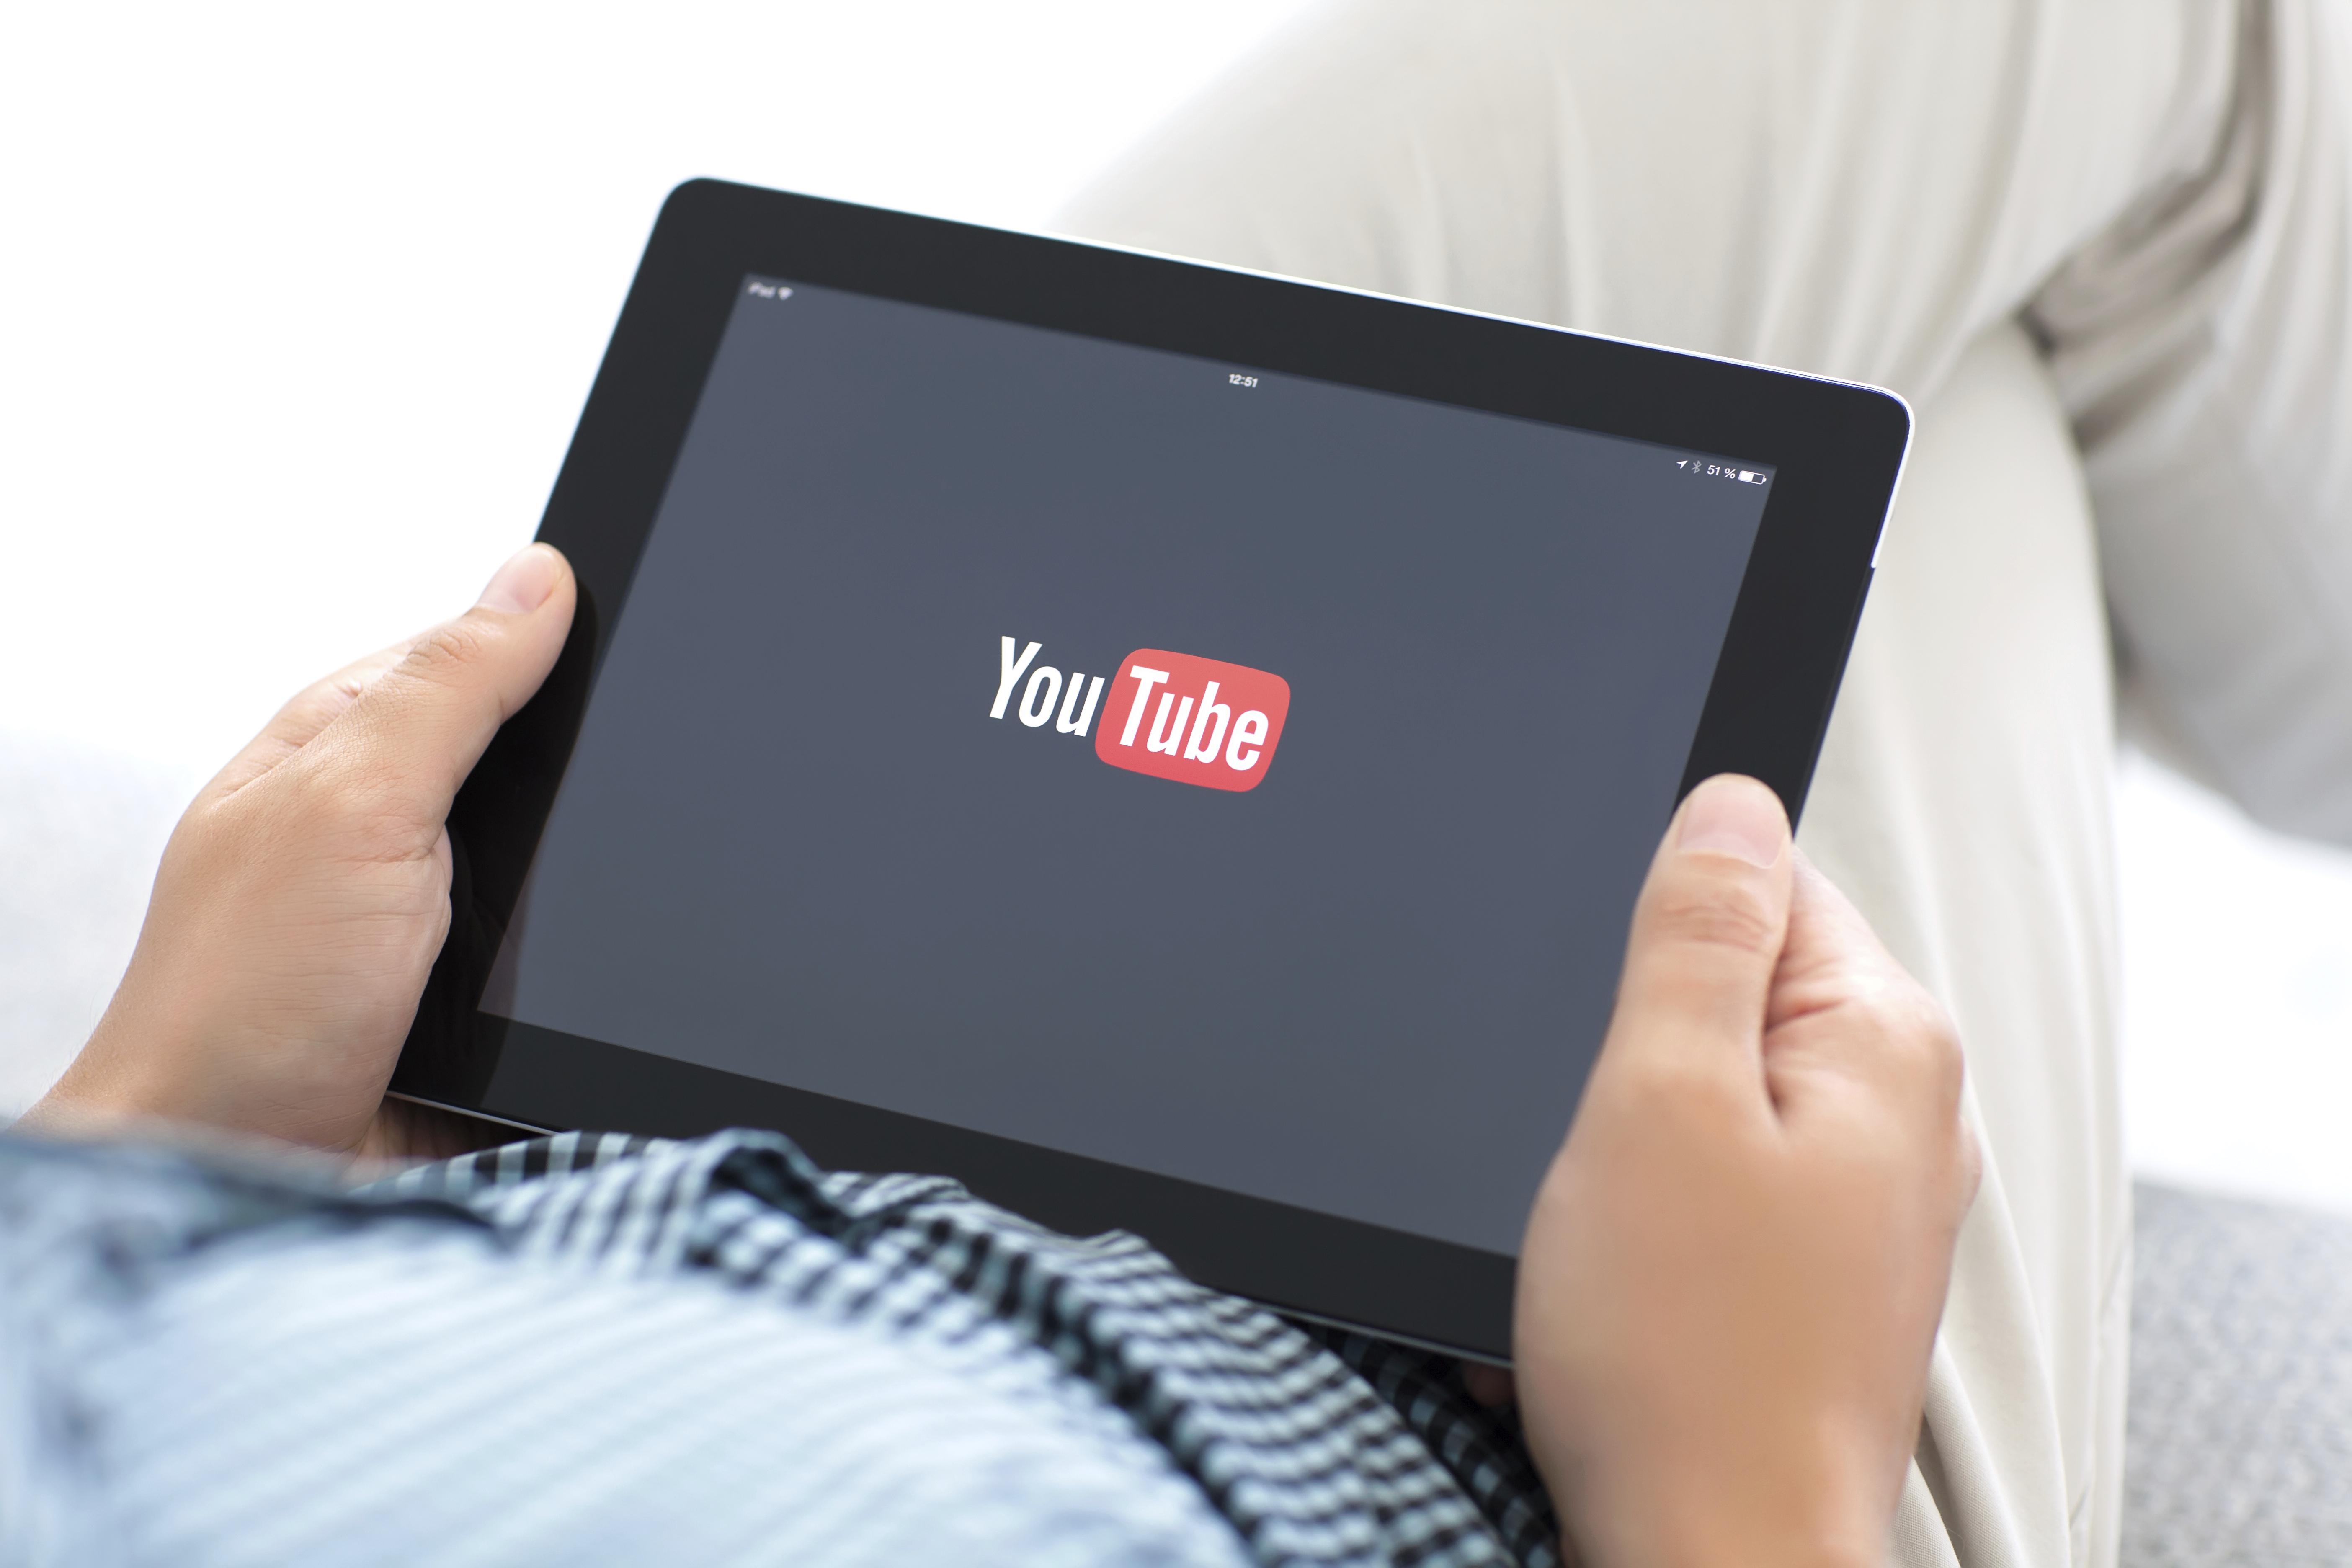 man watching youtube on iPad